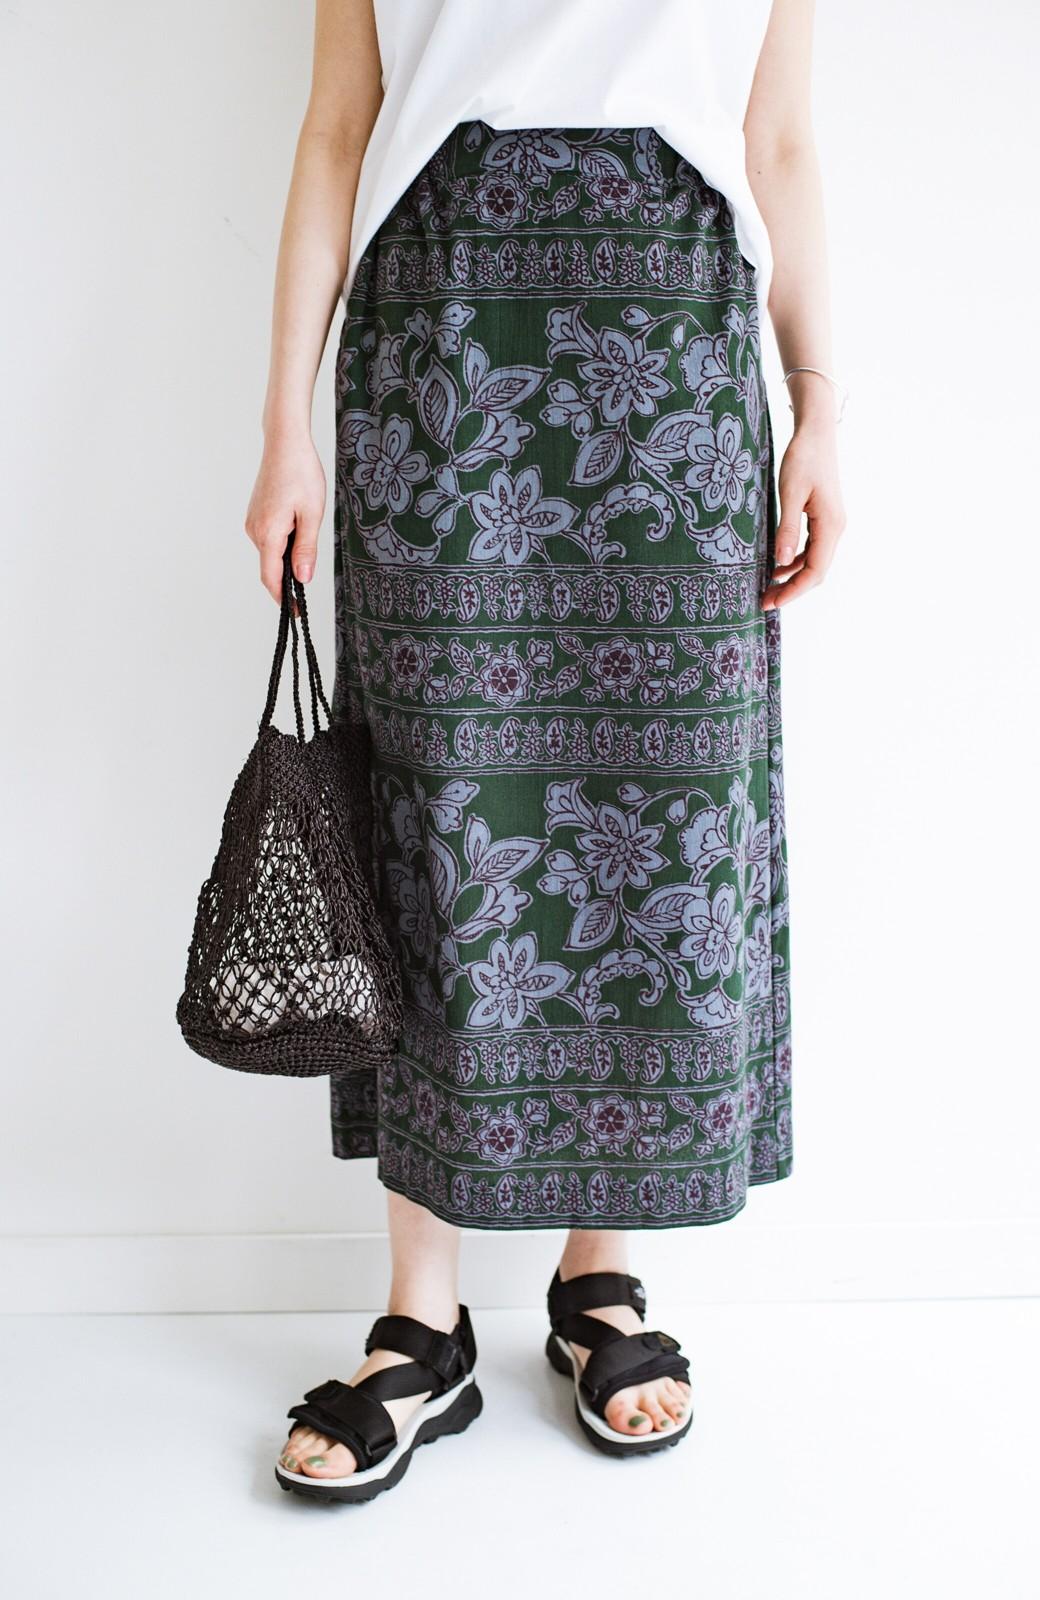 haco! 京都の浴衣屋さんと作った浴衣生地のセミタイトスカート <グリーン系その他>の商品写真1